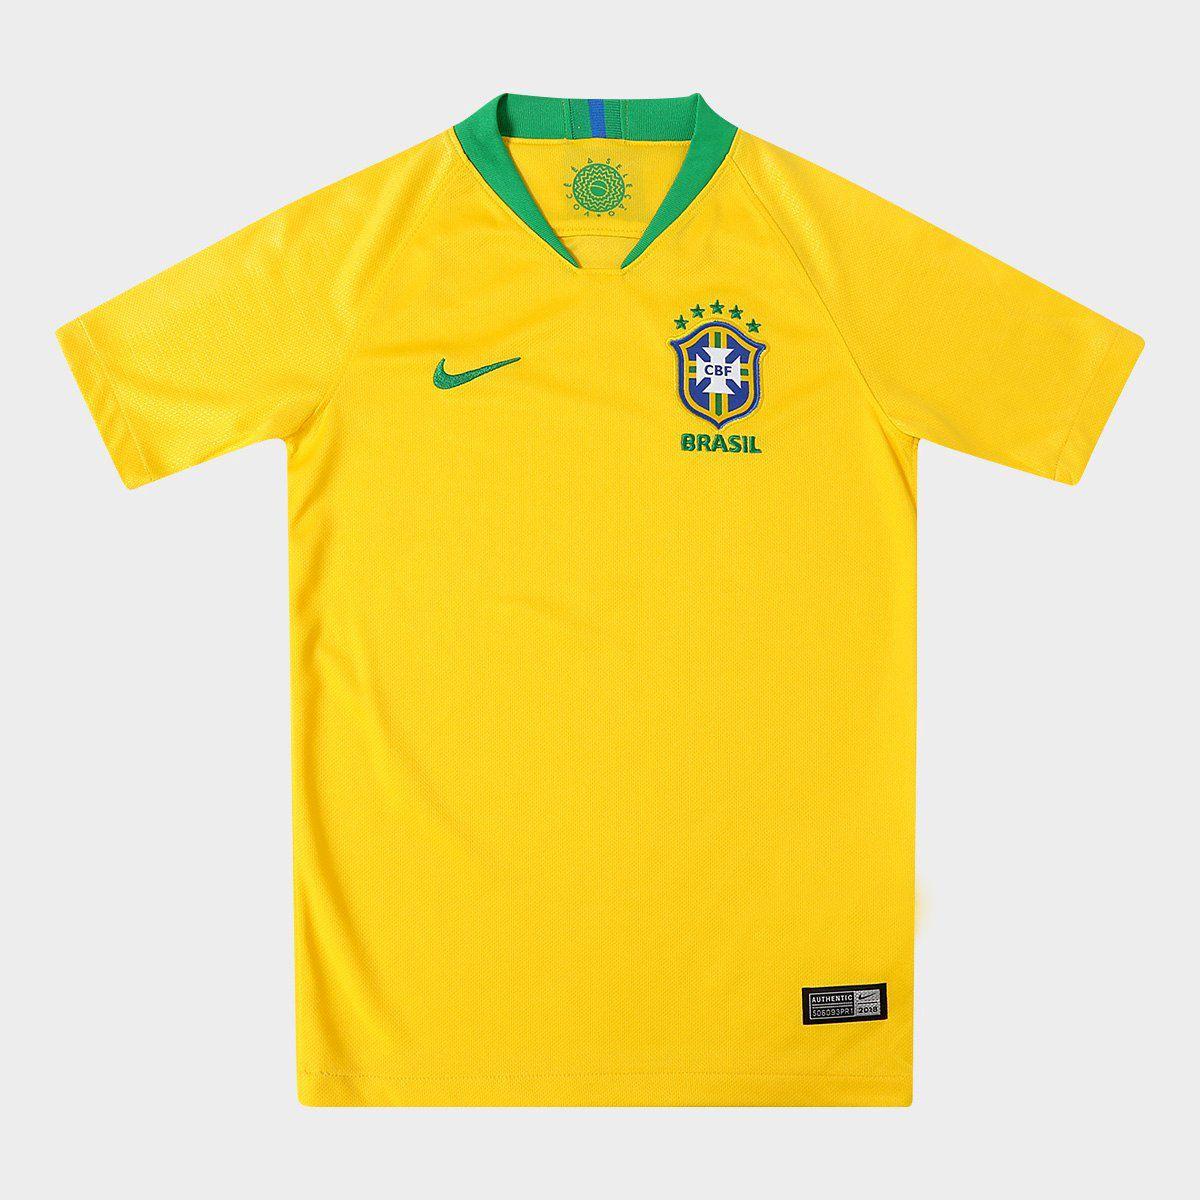 Camisa do Brasil da Copa do Mundo 2018 - …